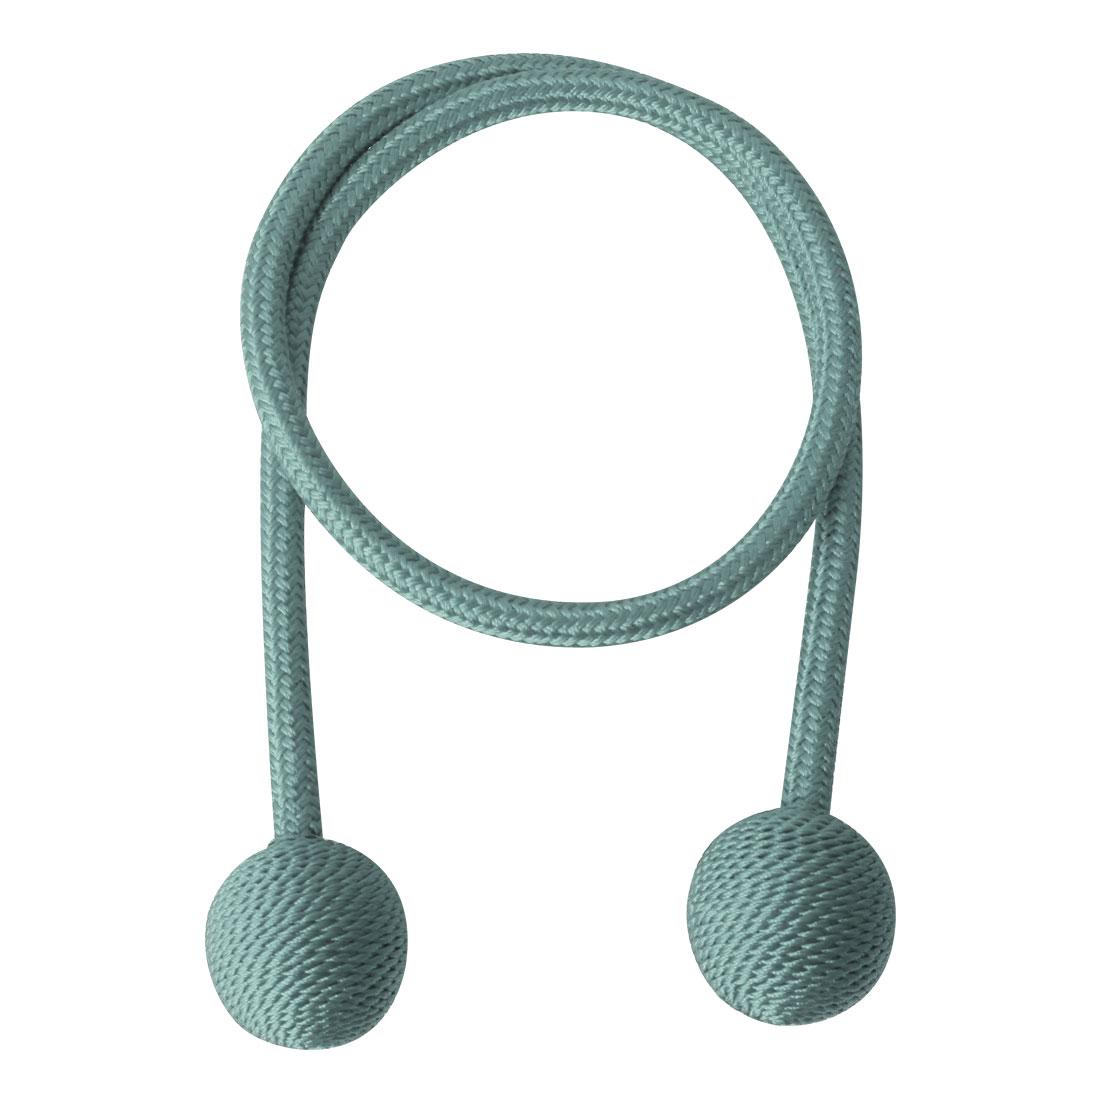 "Curtain Tieback 25.6"" Holdback Decorative Rope Curtain Holders, Blue"